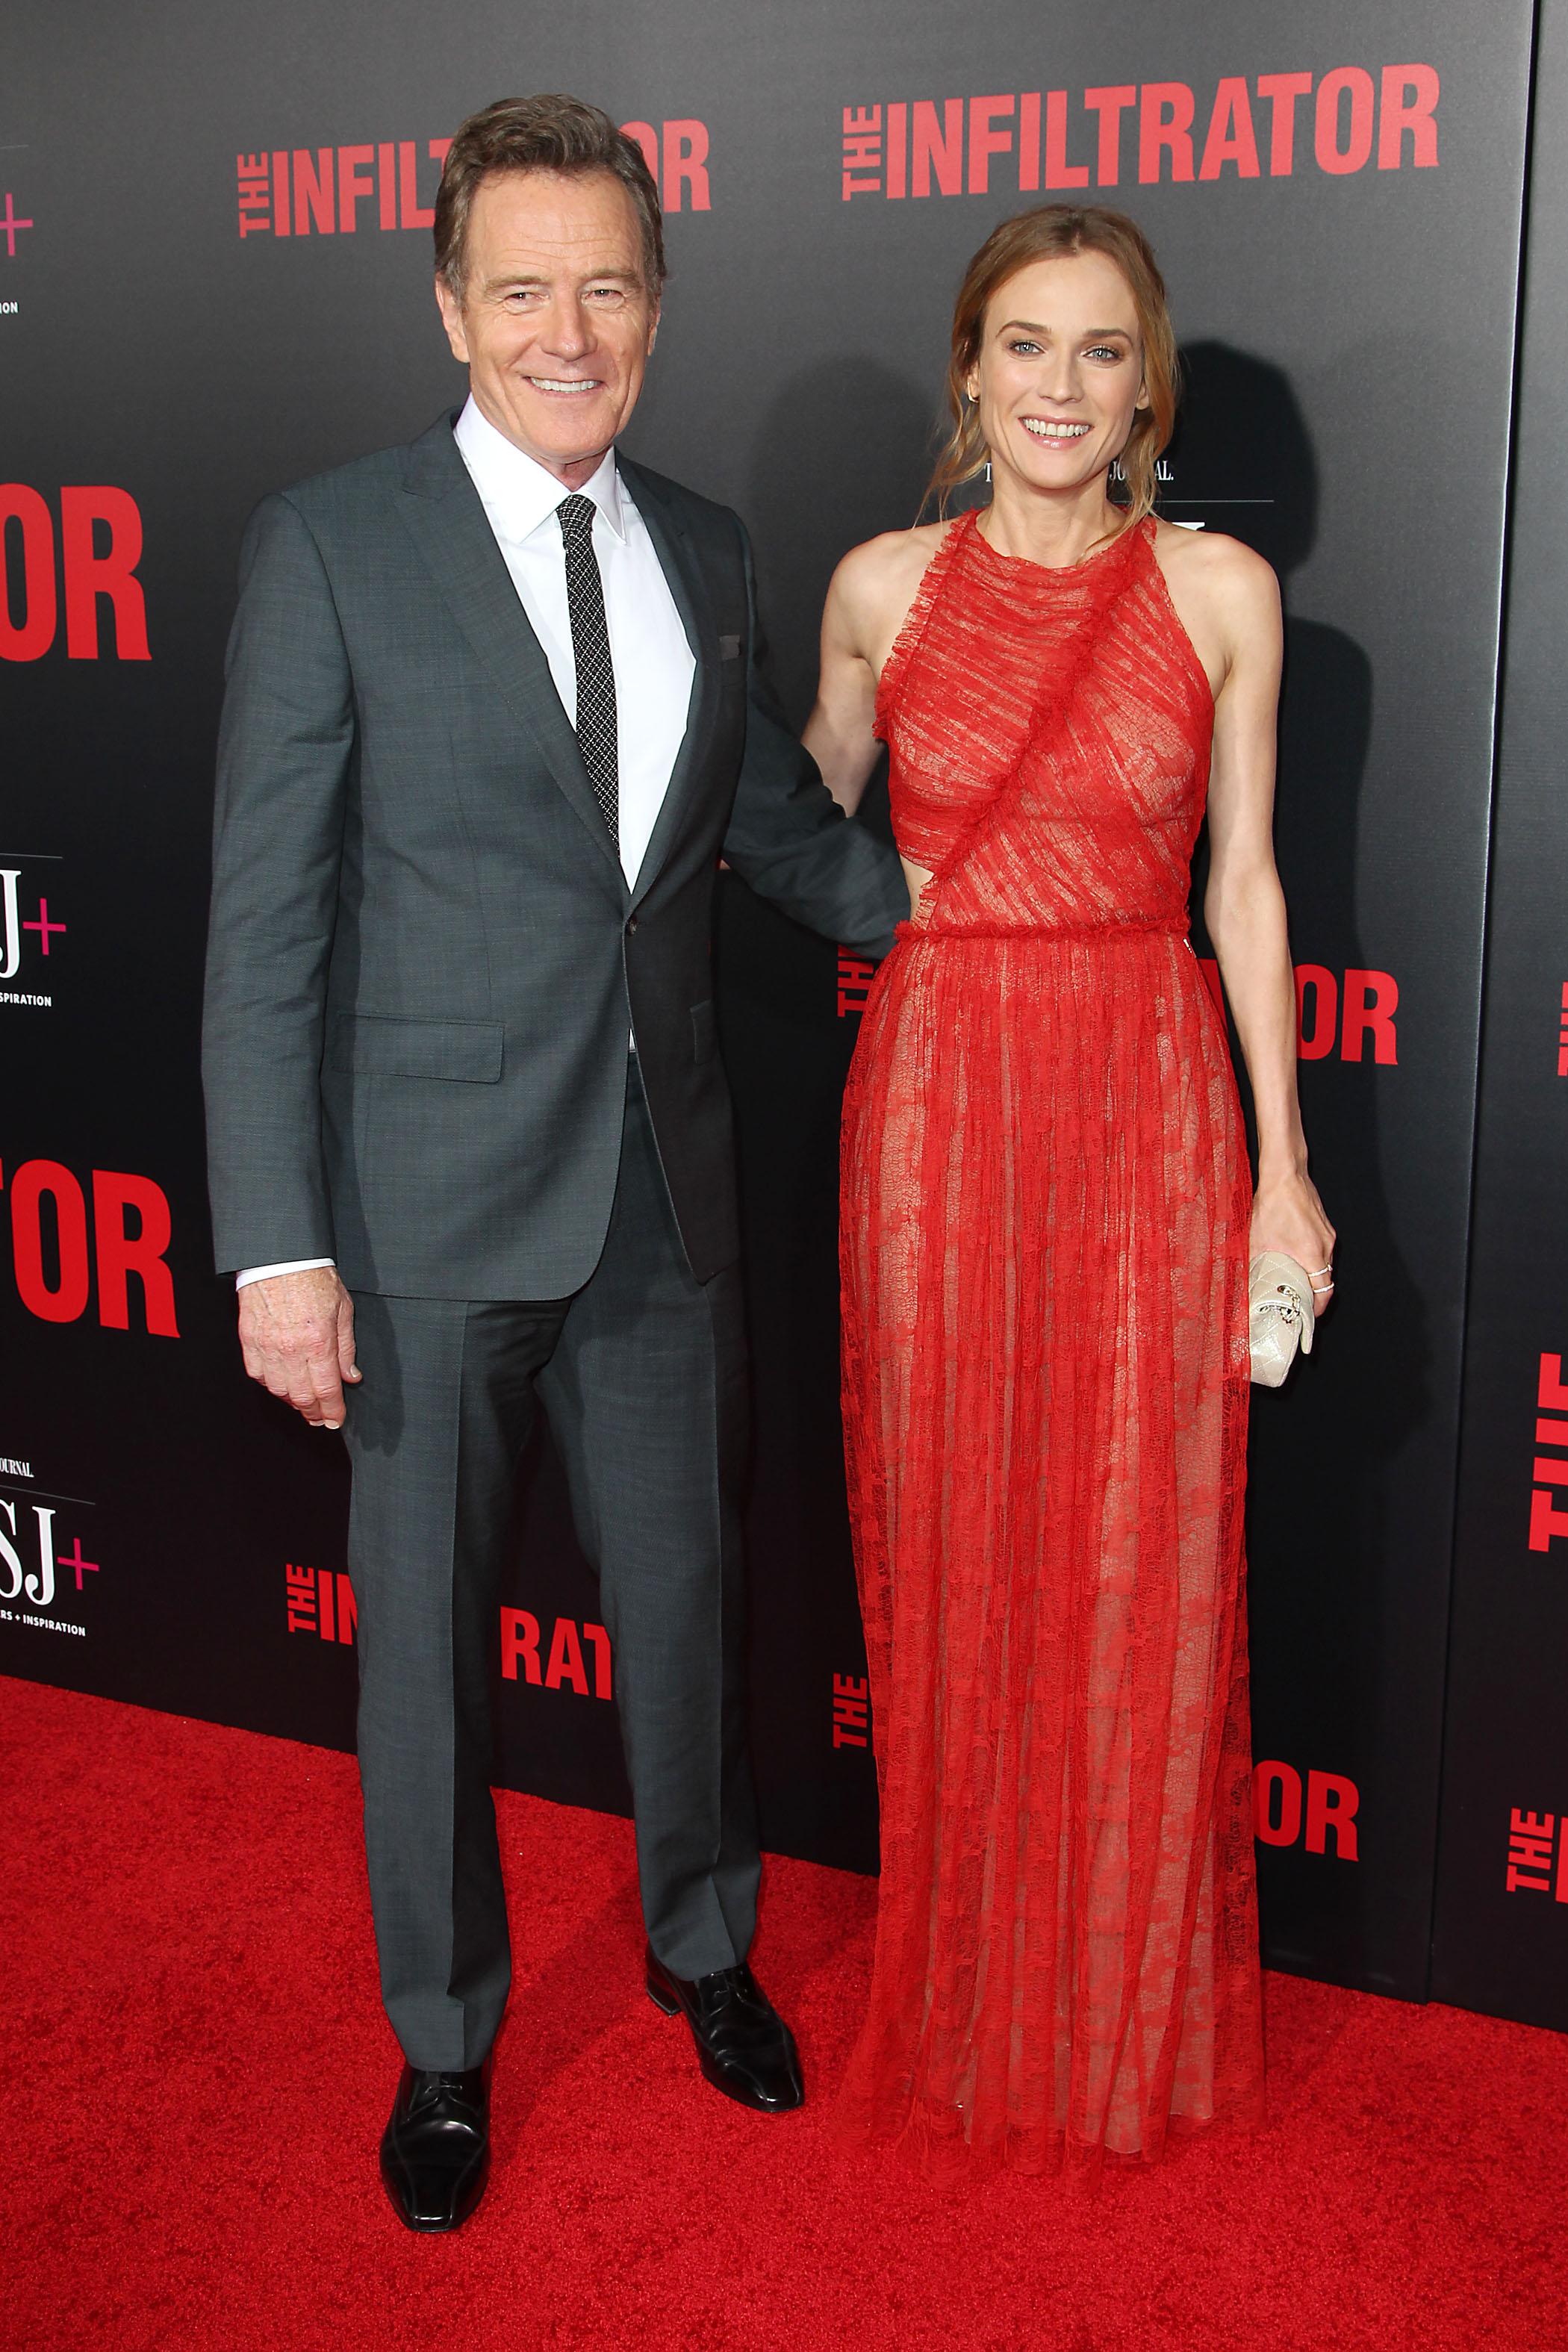 Bryan Cranston and Diane Kruger